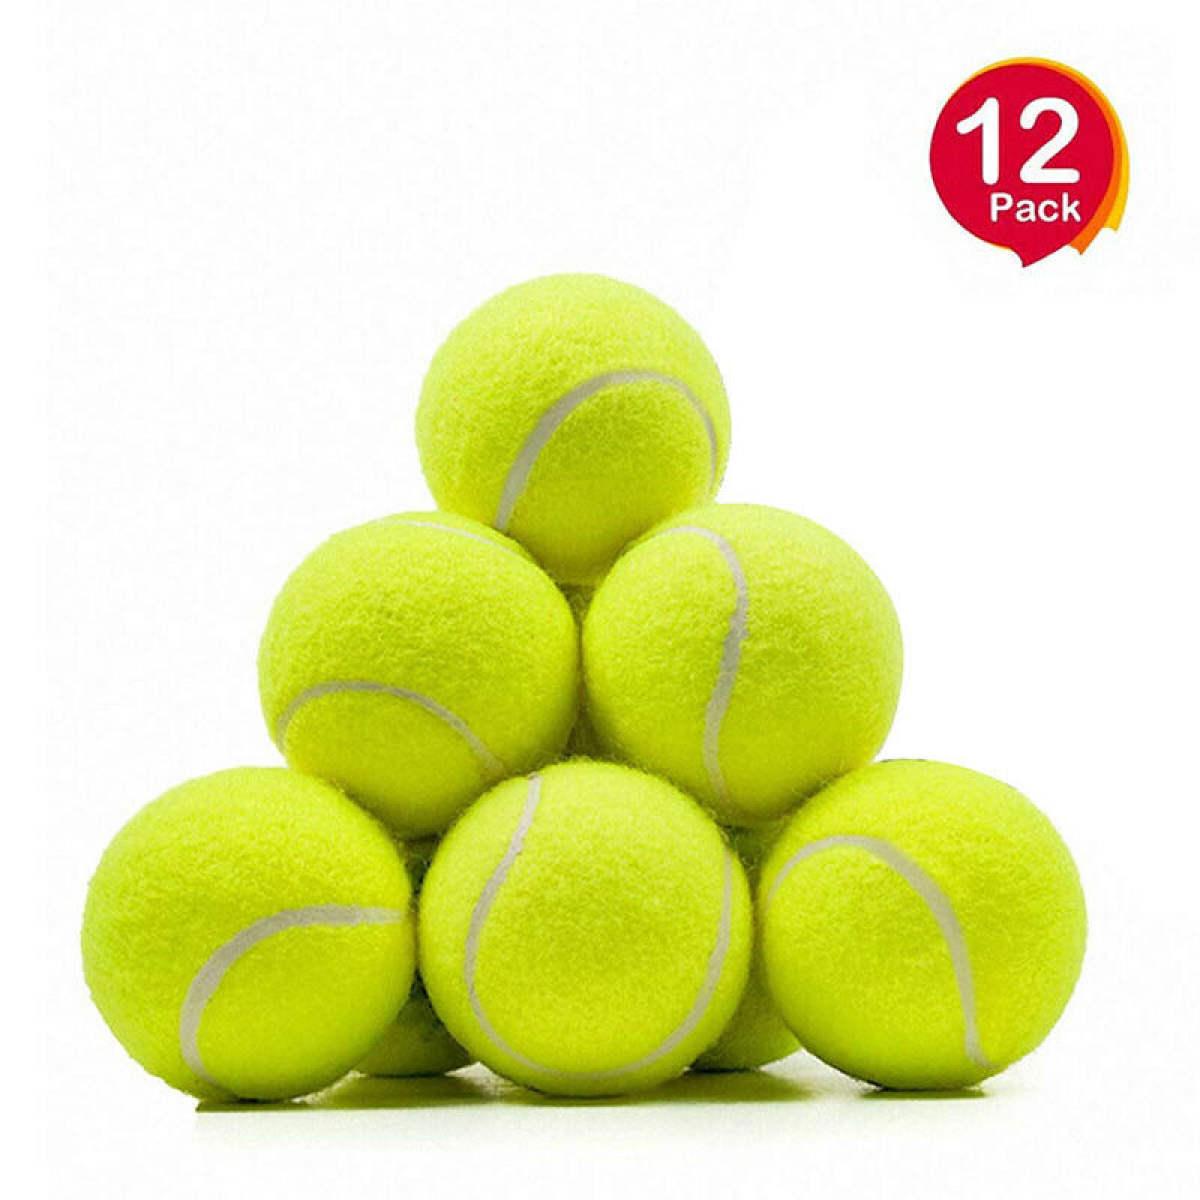 12 Pack - Tennis Balls For Kids - Cricket Balls Multi color.